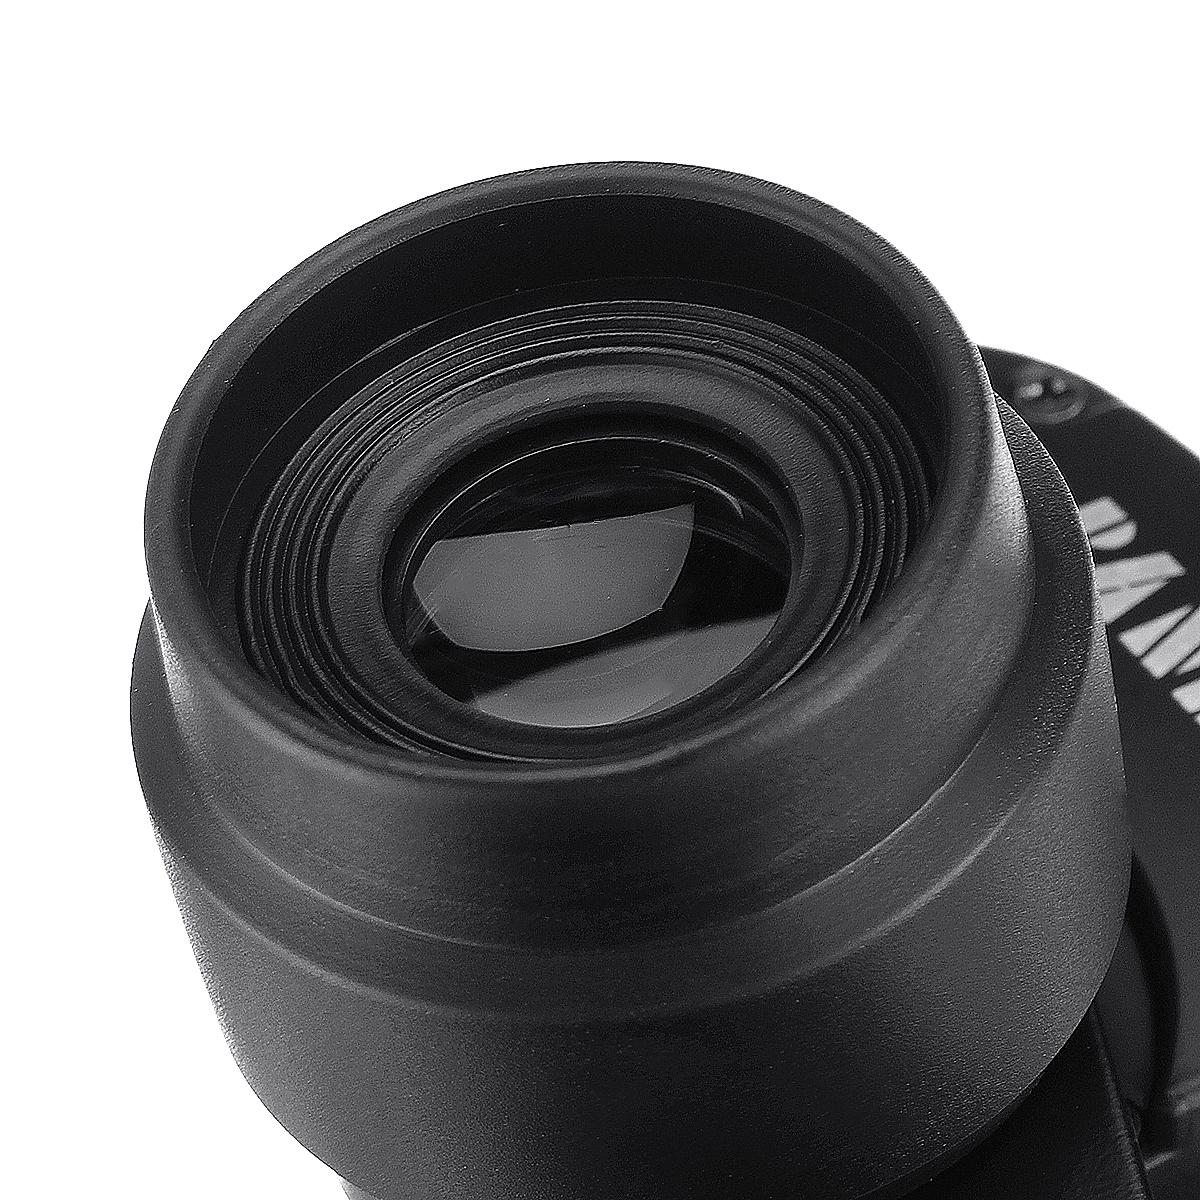 8X40 Outdoor Tactical Marine Binoculars HD Optic Night Vision Birdwatching Camping Telescope